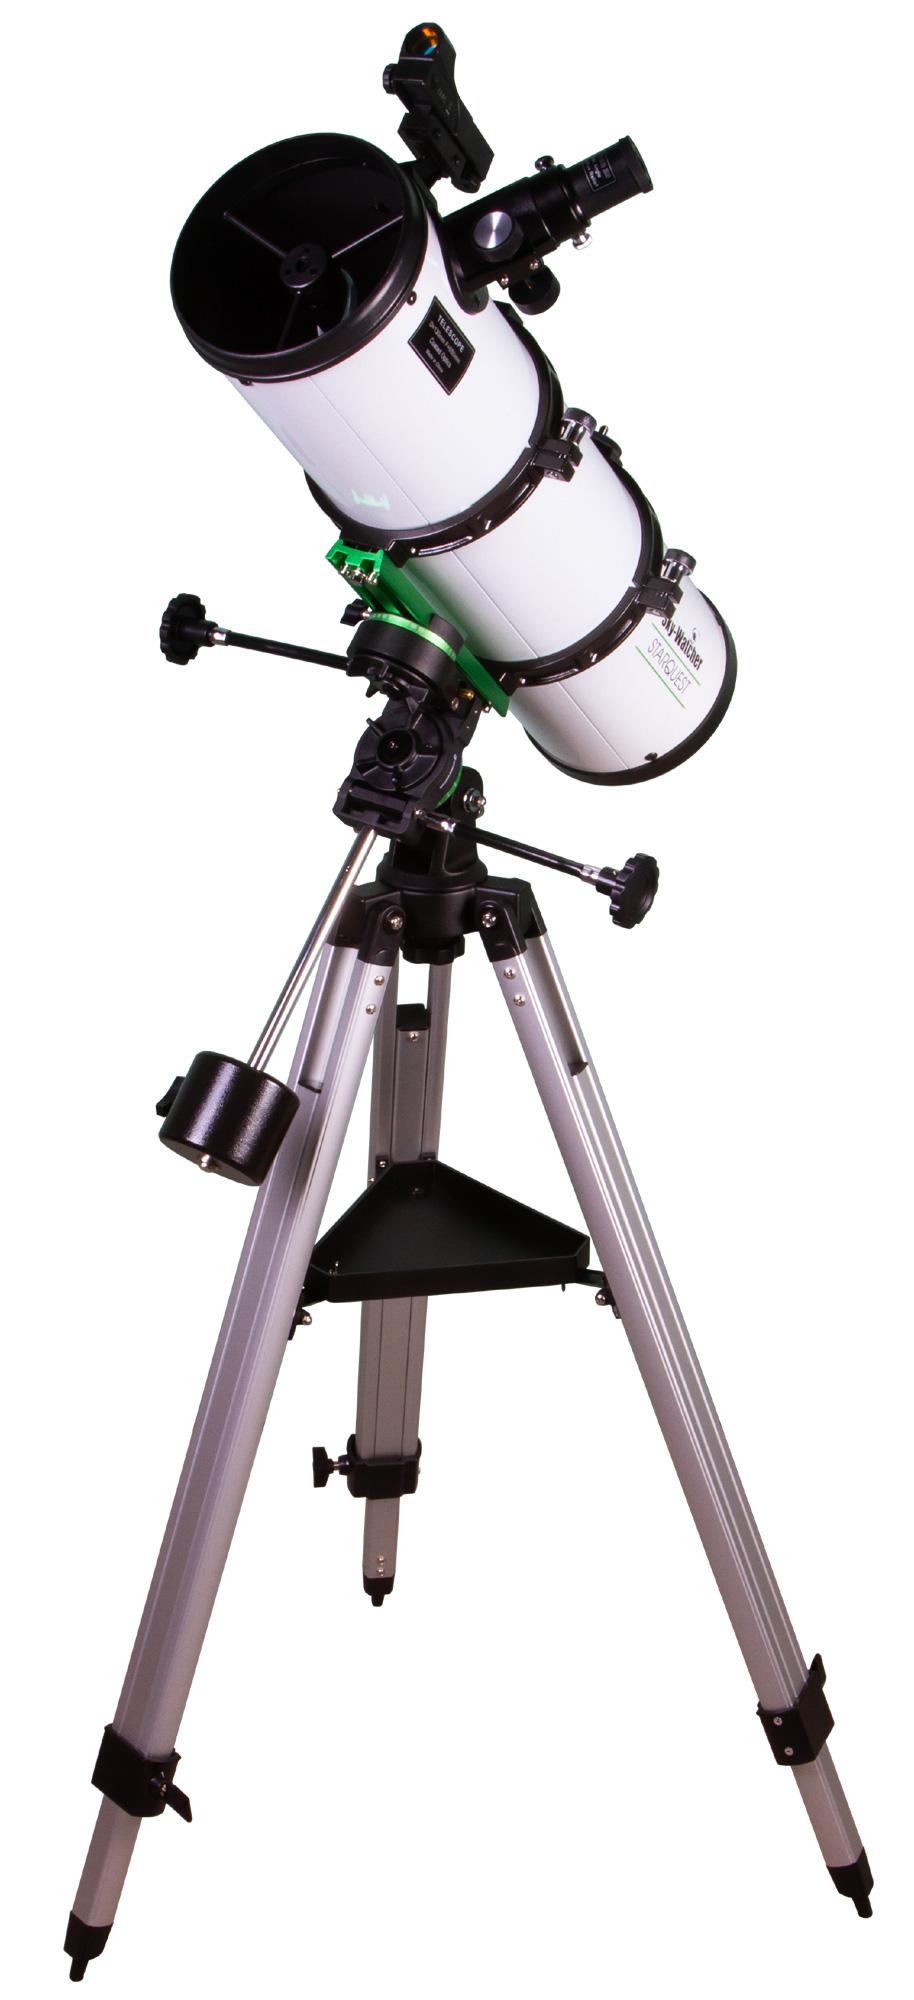 Картинка для Телескоп Sky-Watcher N130/650 StarQuest EQ1